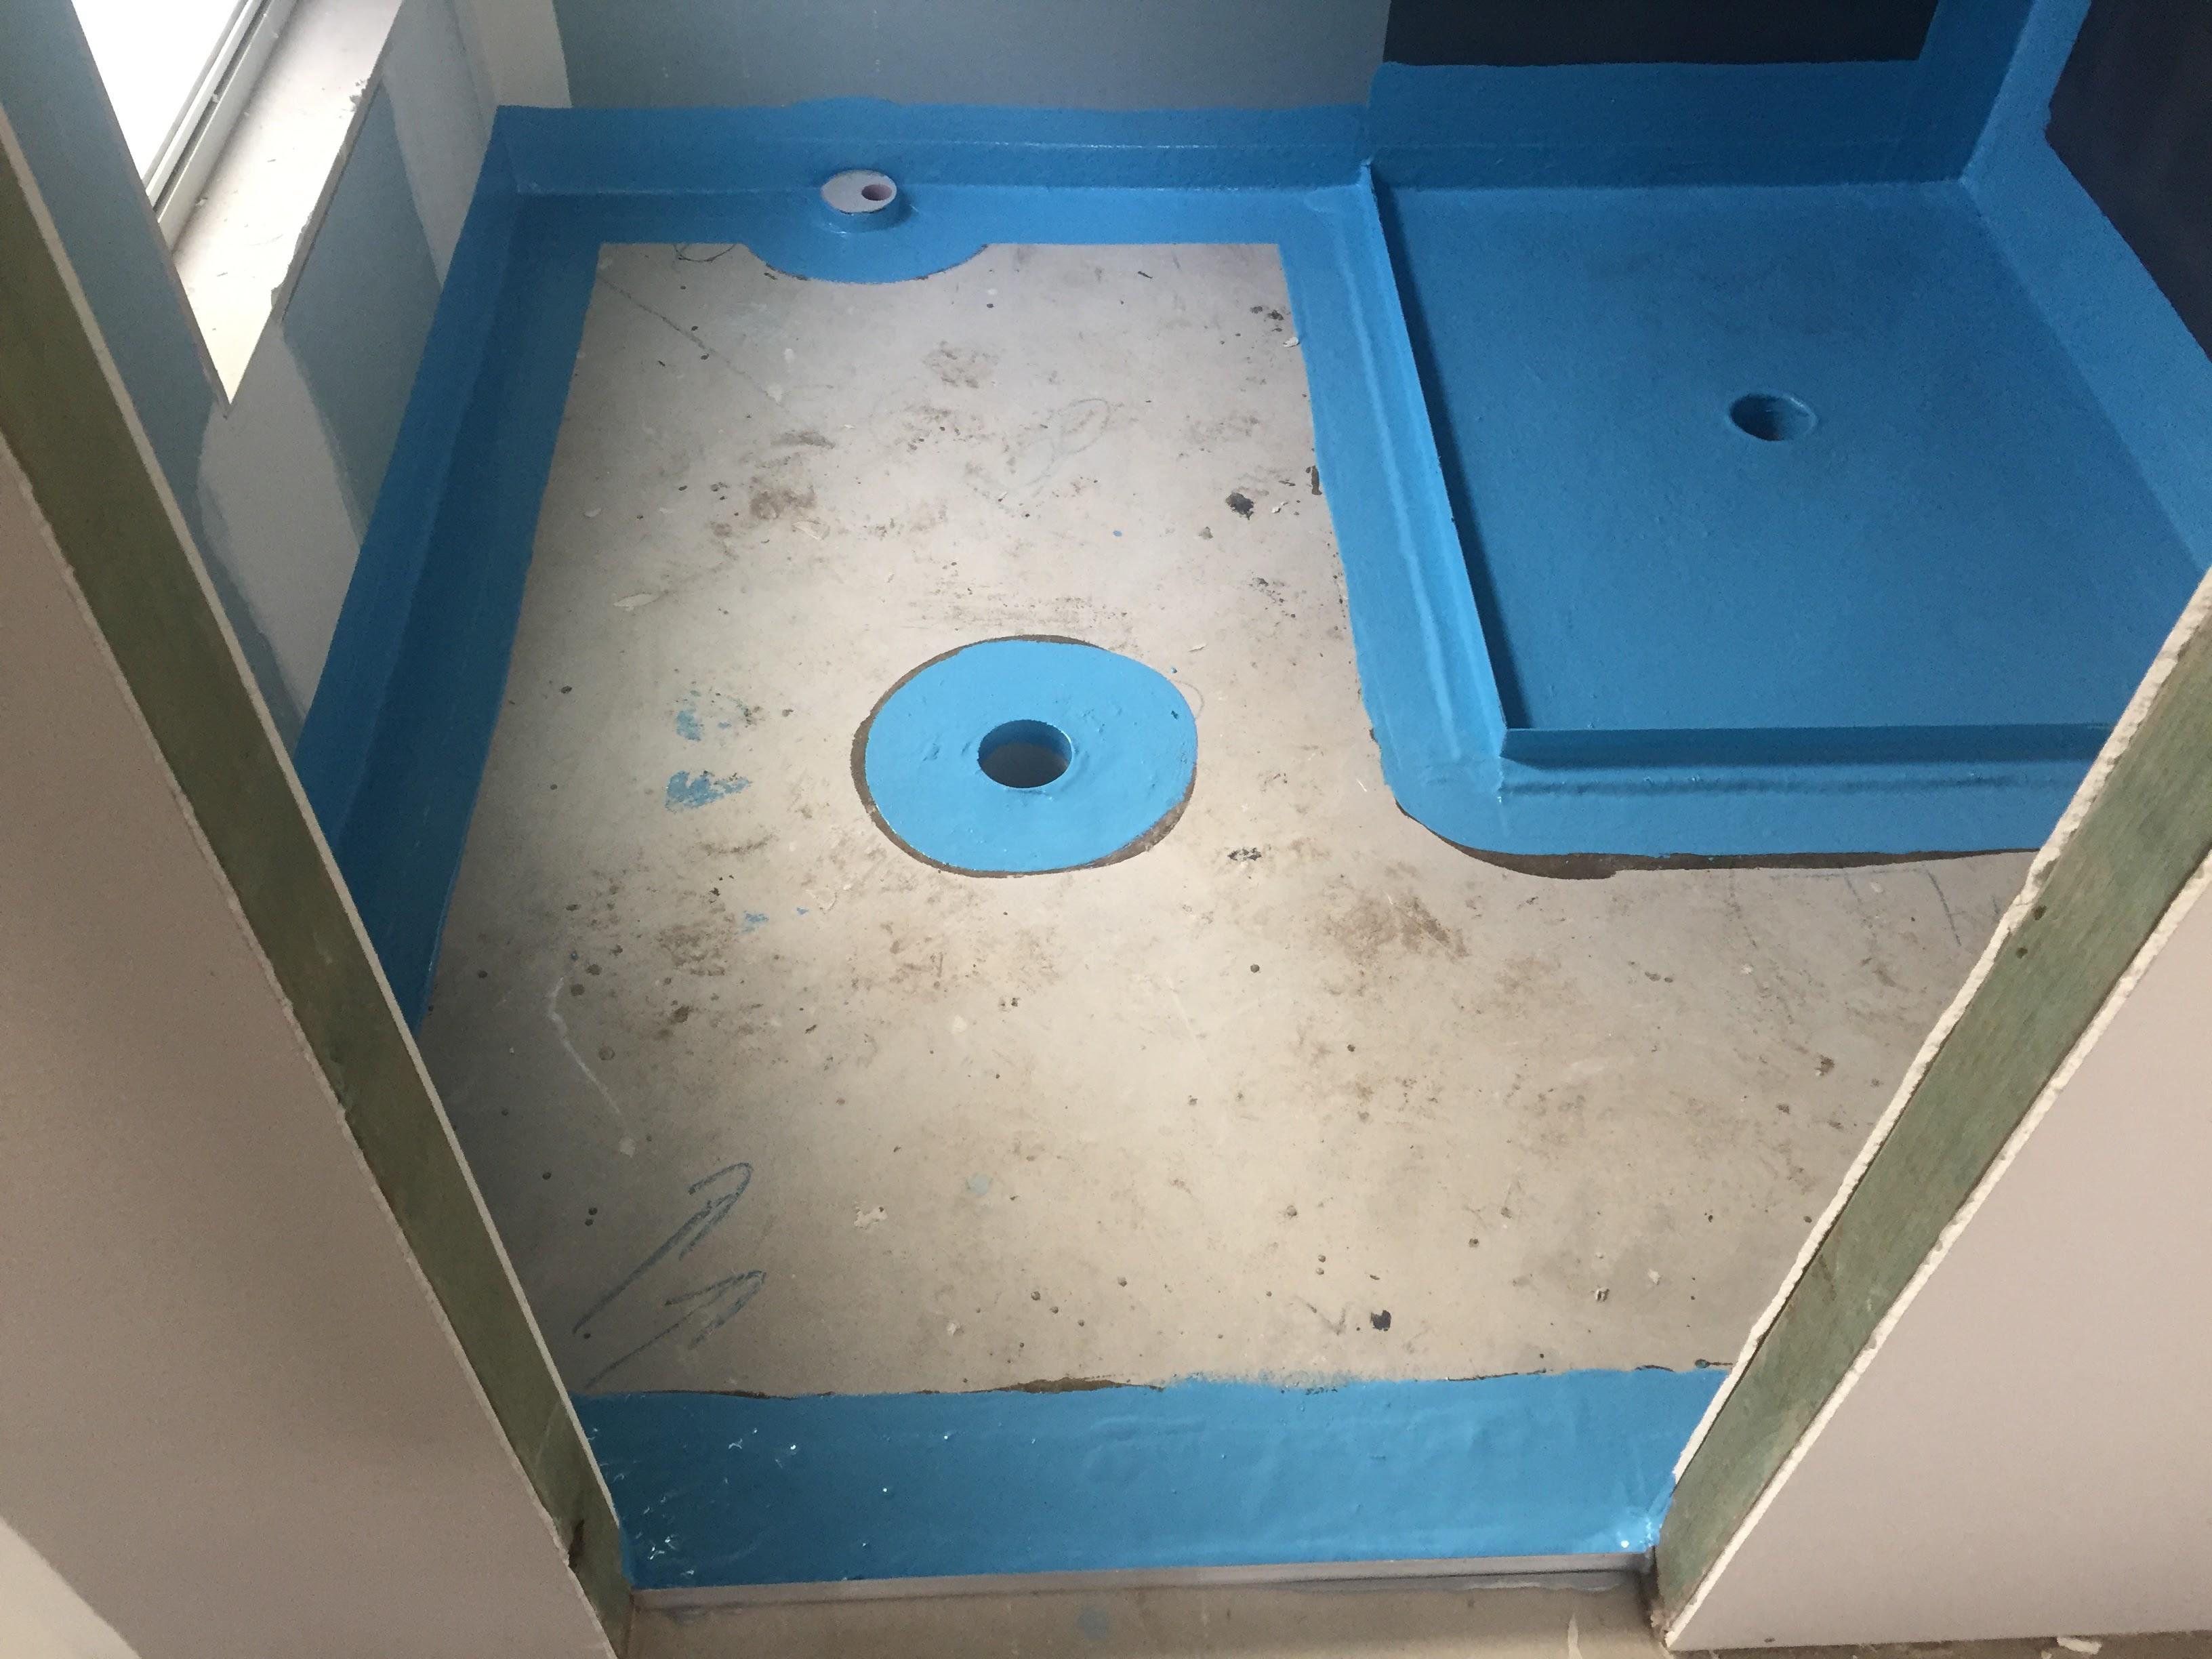 Bathroom Fibreglass Waterproofing - Ideal Waterproofing